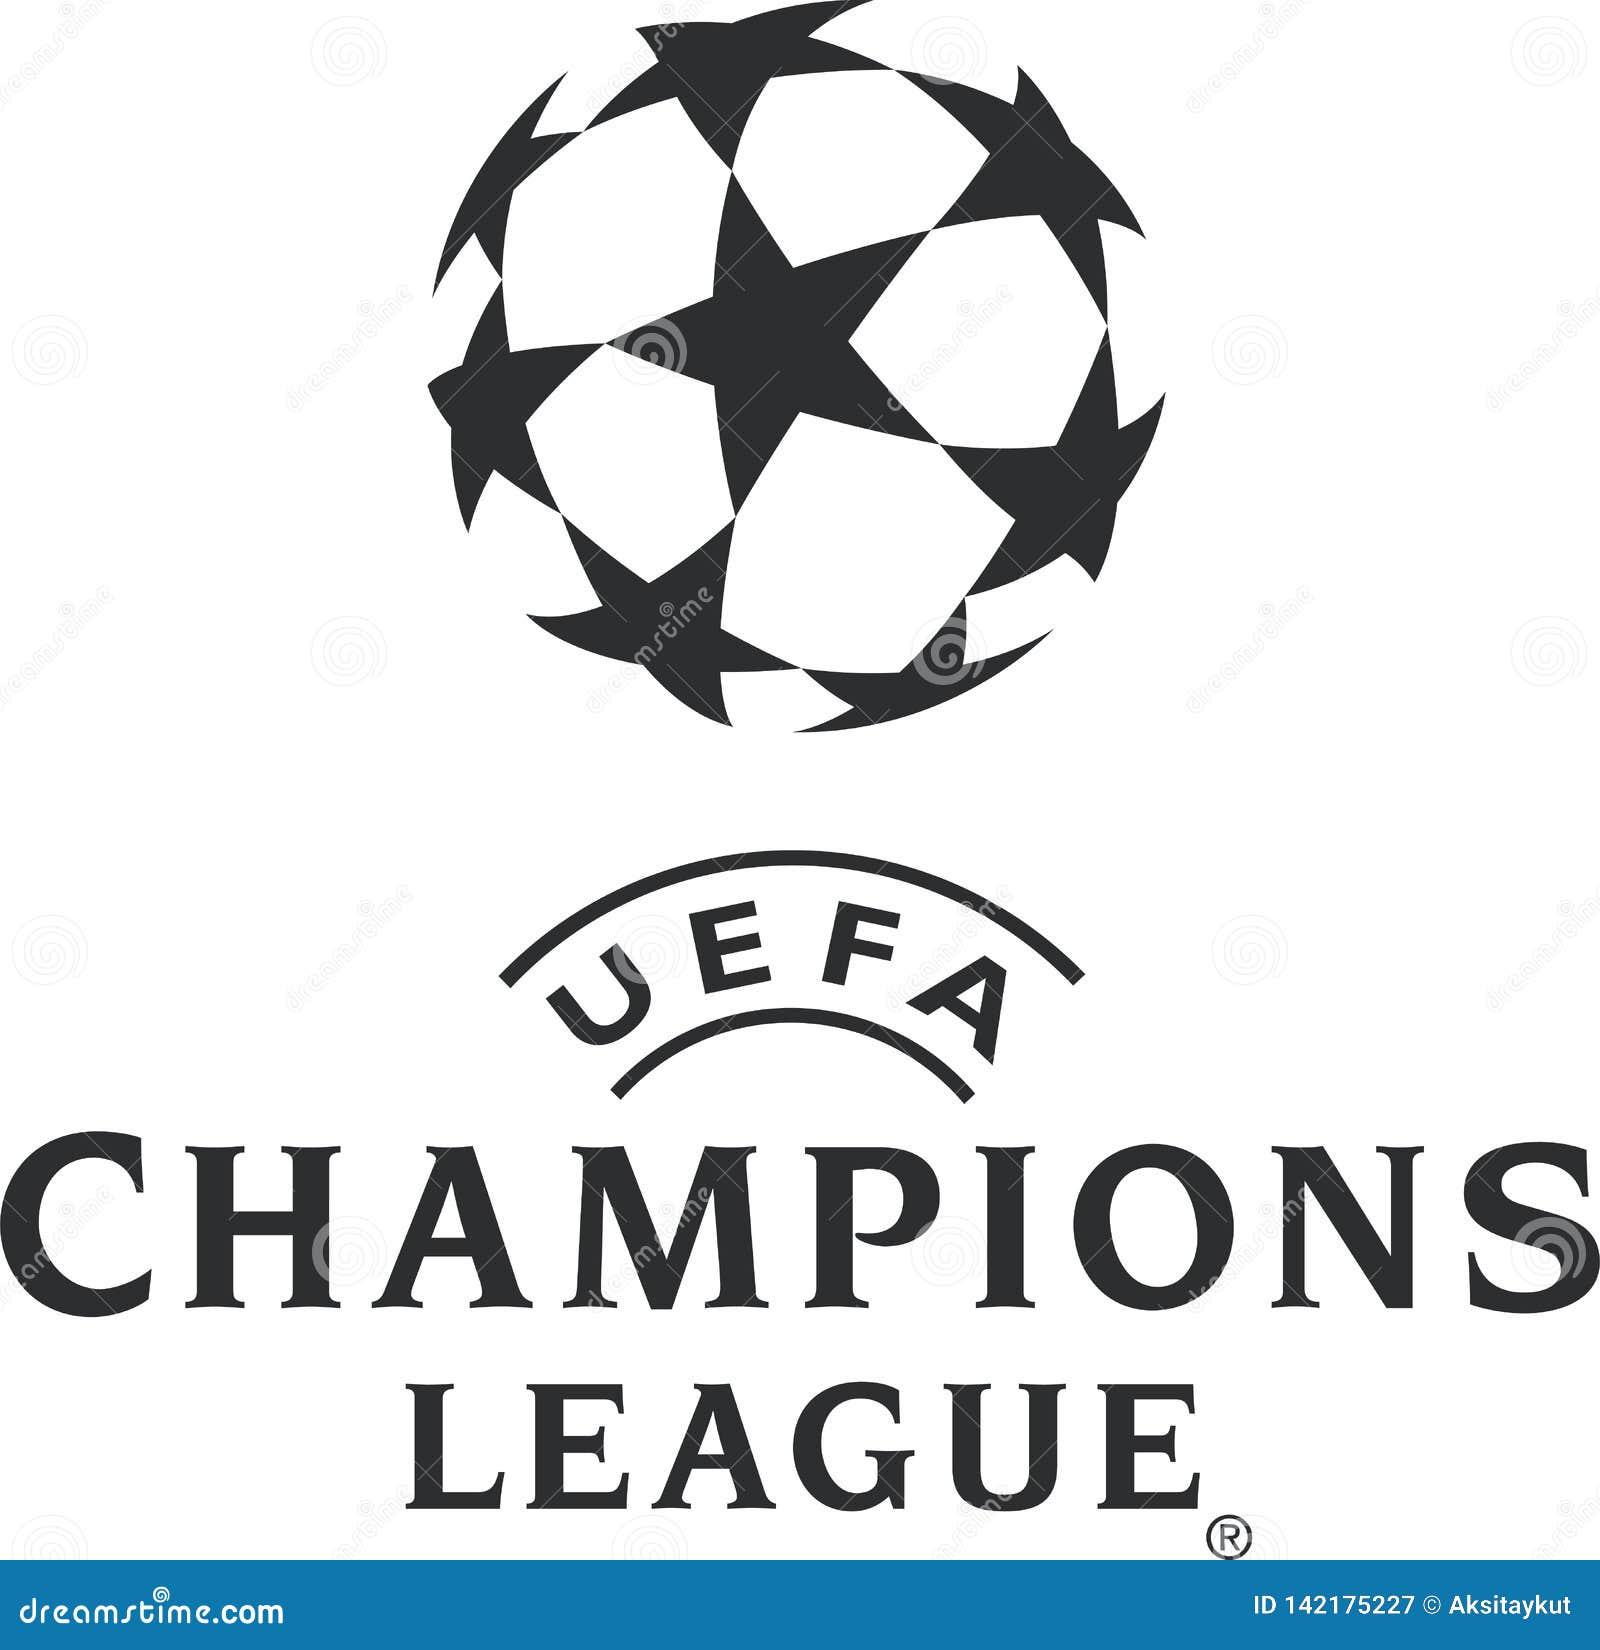 UEFA Champions League logo ikona